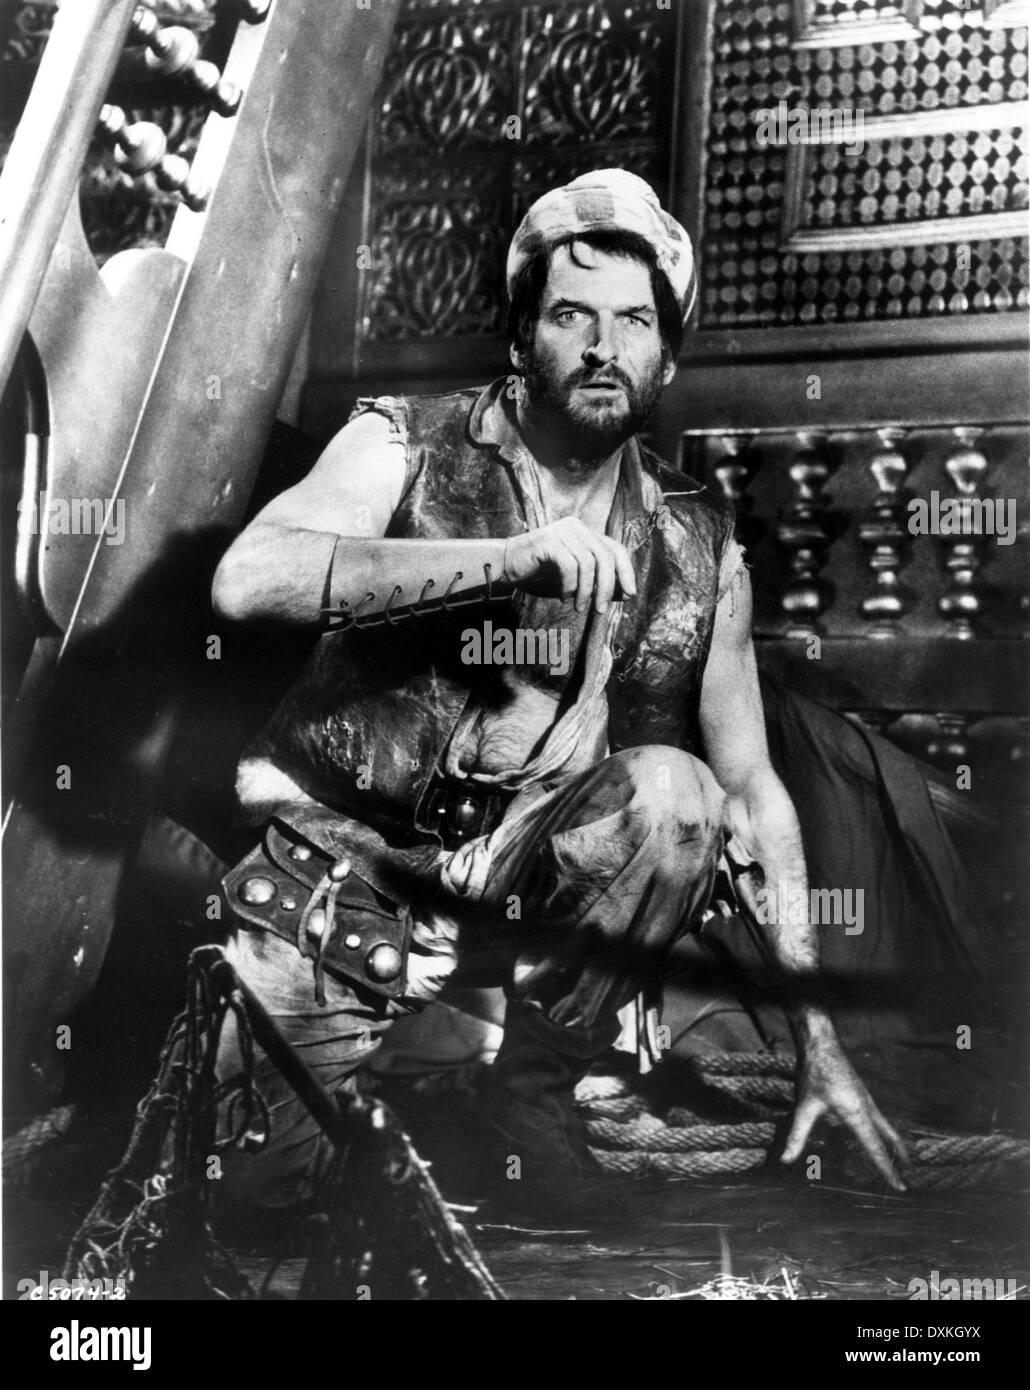 CAPTAIN SINBAD (US/W GER 1963) GEOFFREY TOONE - Stock Image